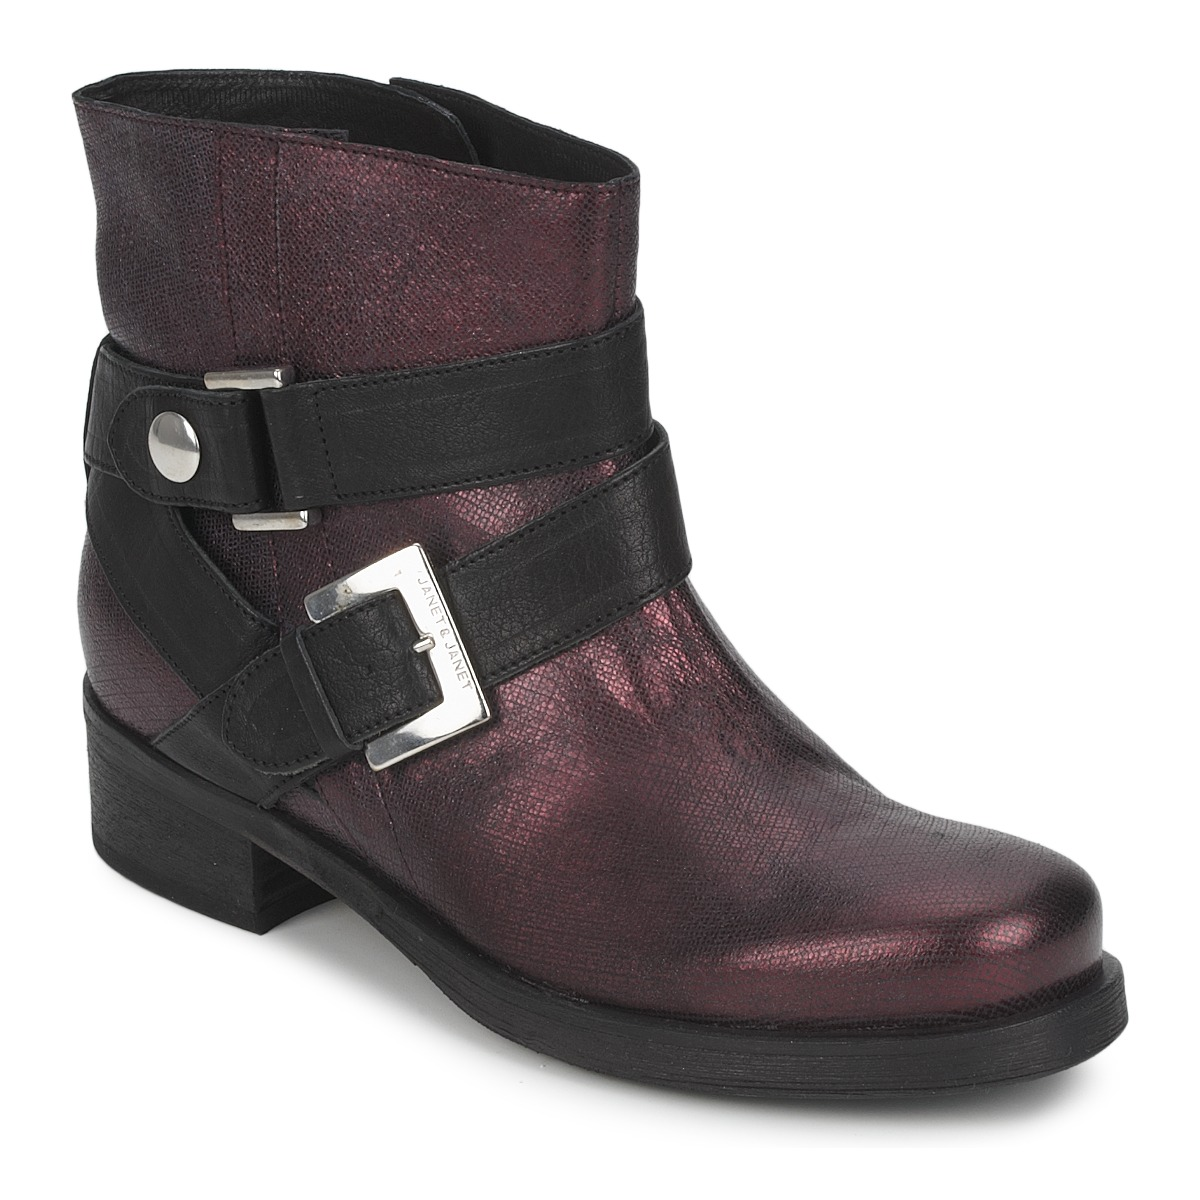 Janet&Janet URSUS VAN Bordeaux - Kostenloser Versand bei Spartoode ! - Schuhe Boots Damen 117,50 €